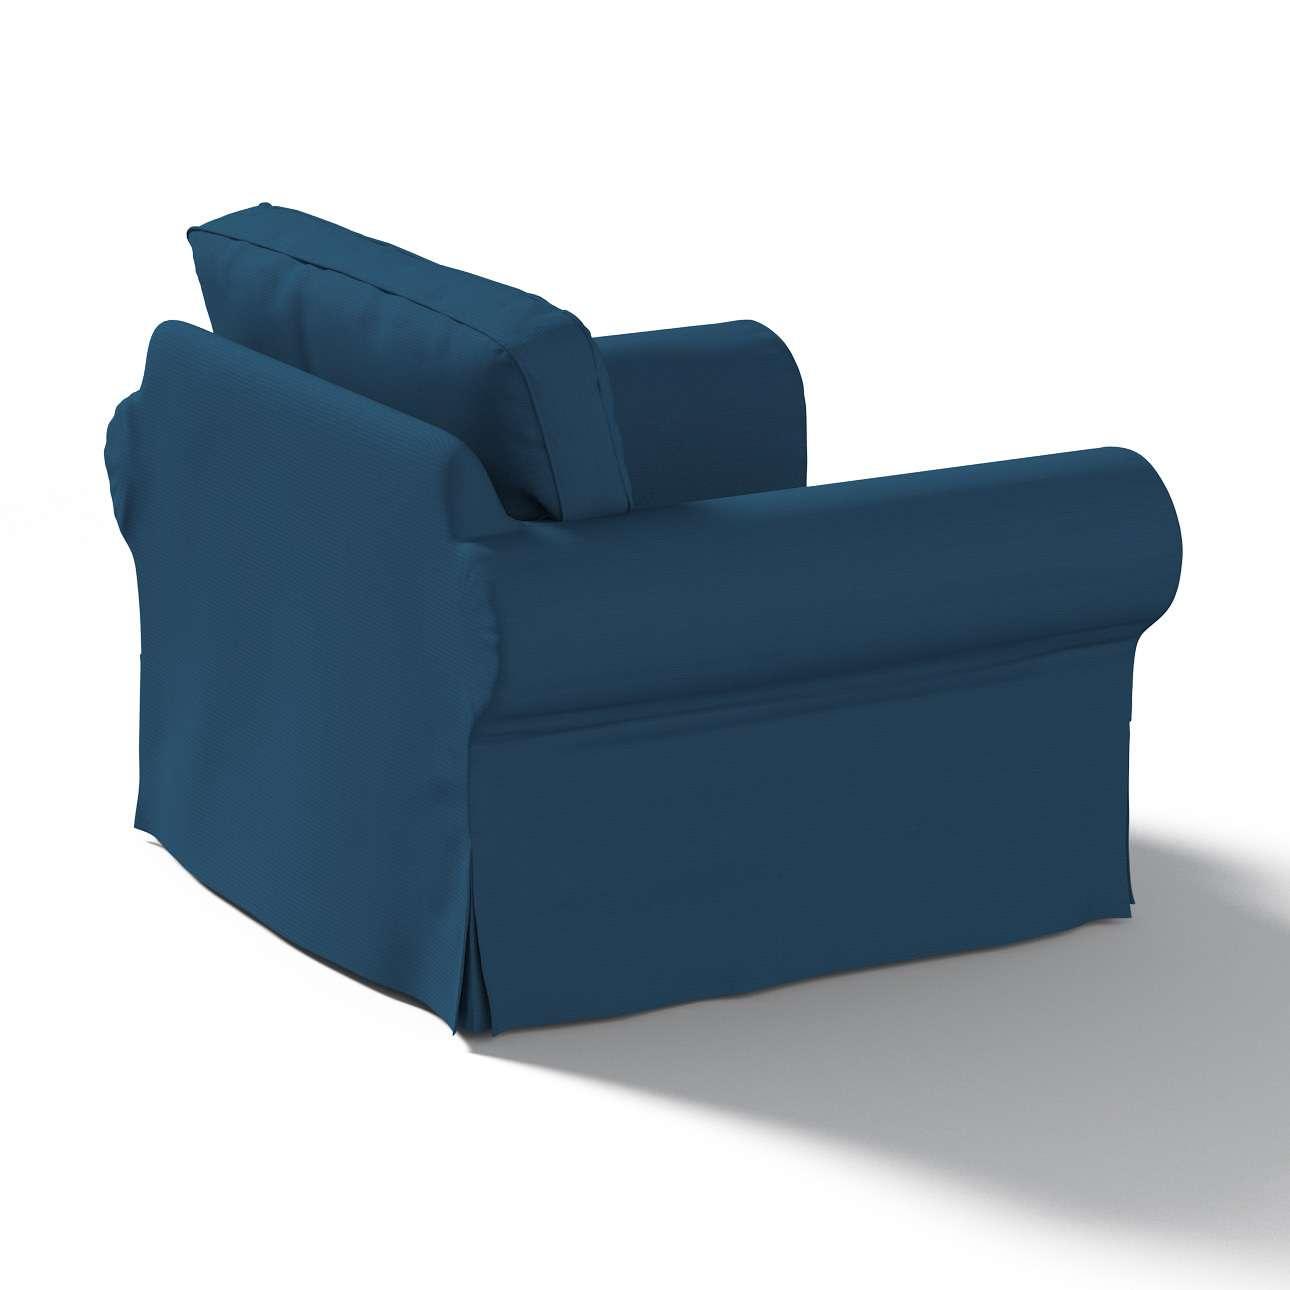 Ektorp Sesselbezug Sesselhusse, Ektorp Sessel von der Kollektion Cotton Panama, Stoff: 702-30